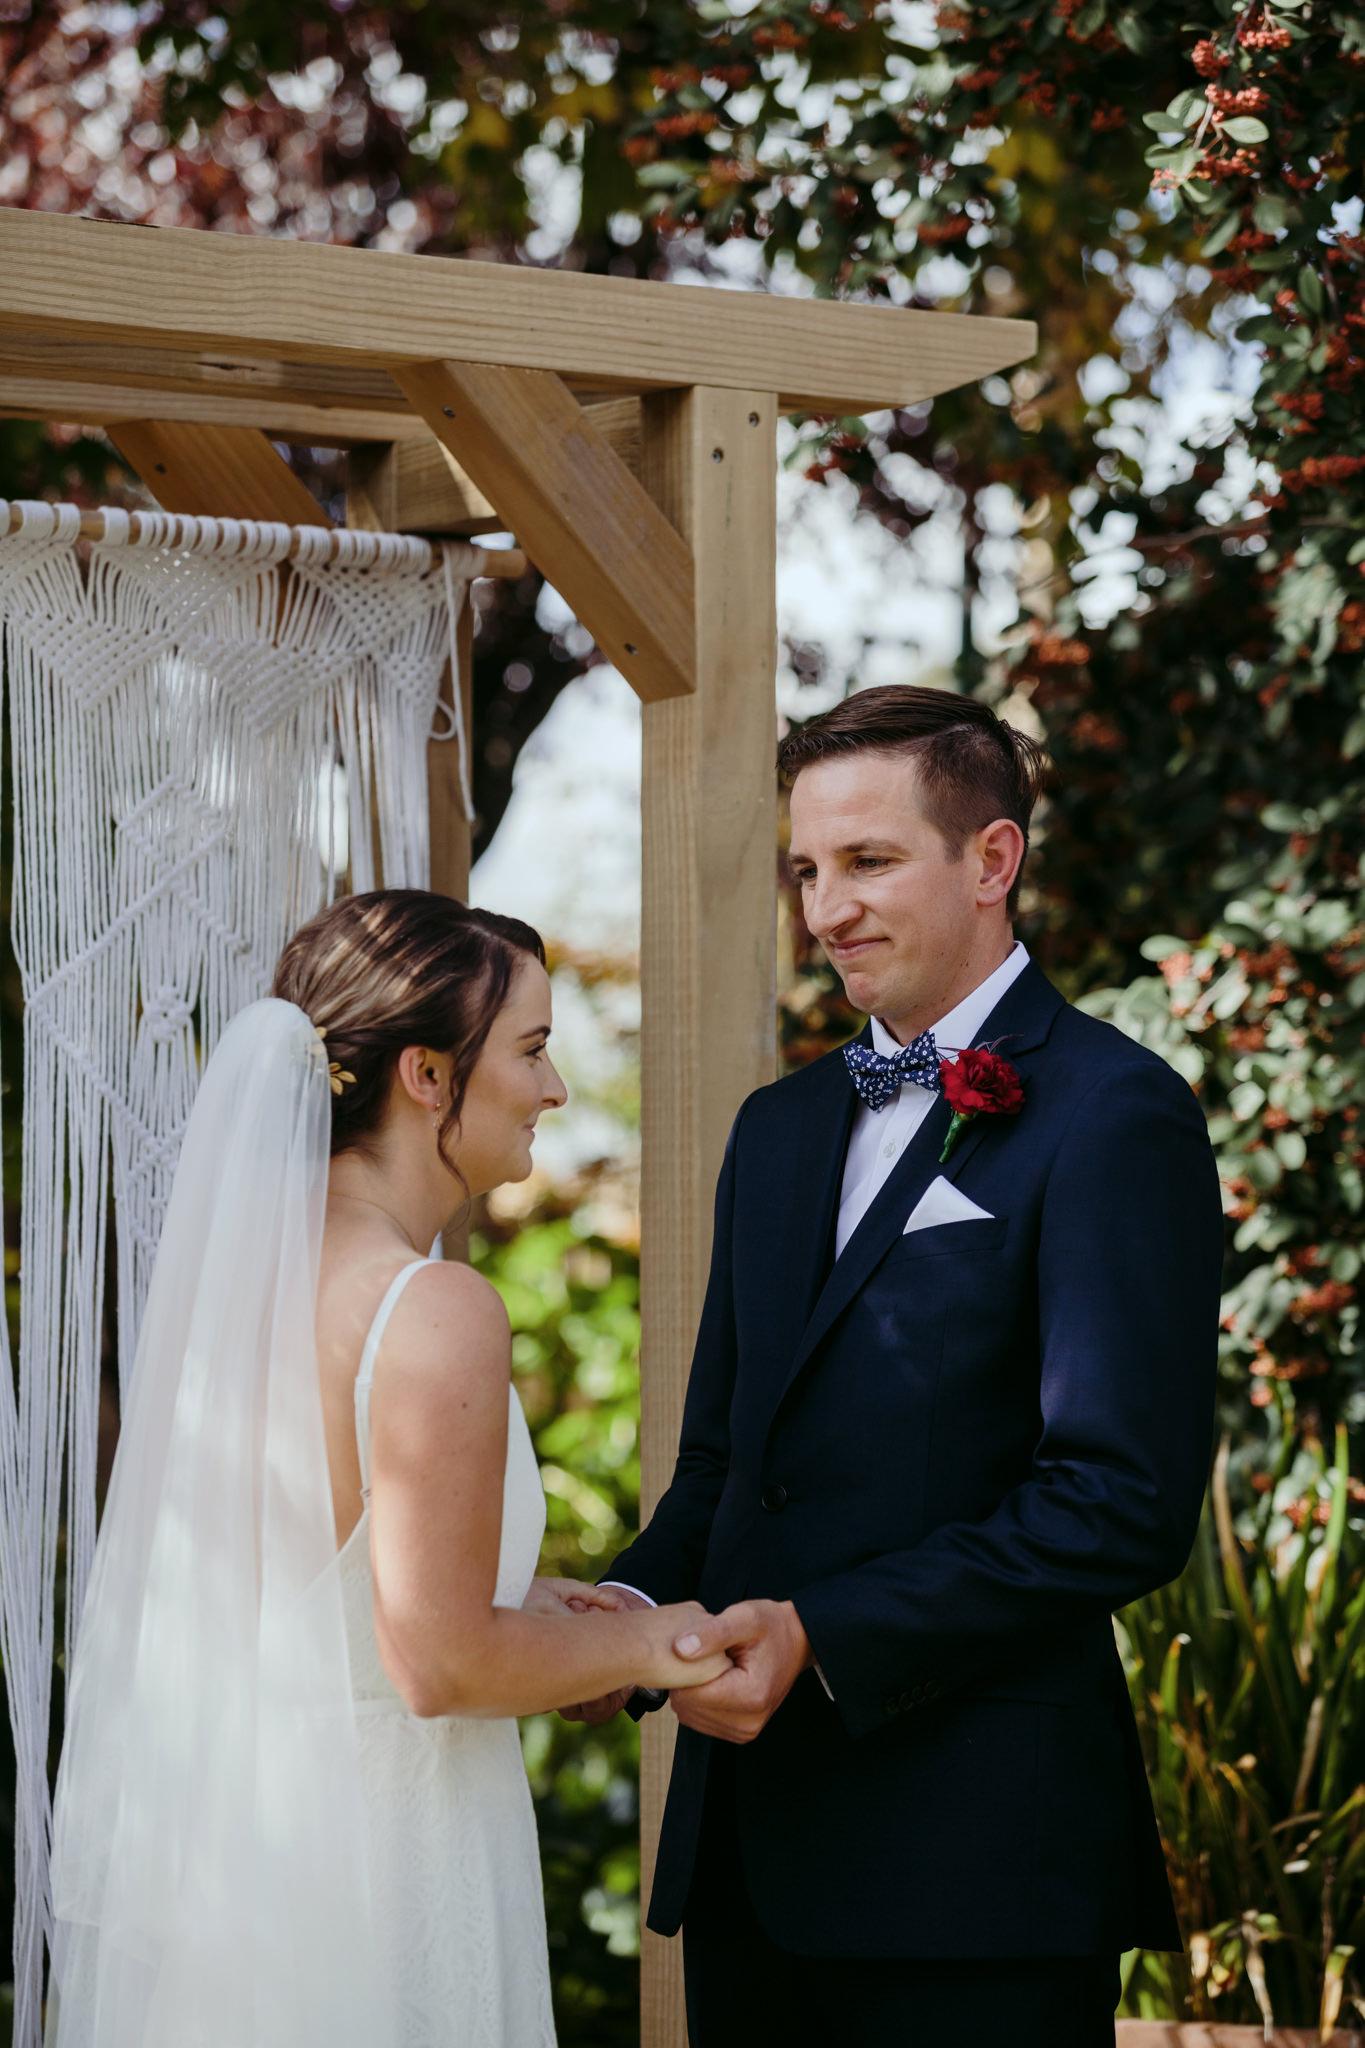 Erin Latimore Mudgee Canberra Wedding Photographer ROSEBANK GUESTHOUSE OLD THEATRE TONIC MILLTHORPE_244.JPG